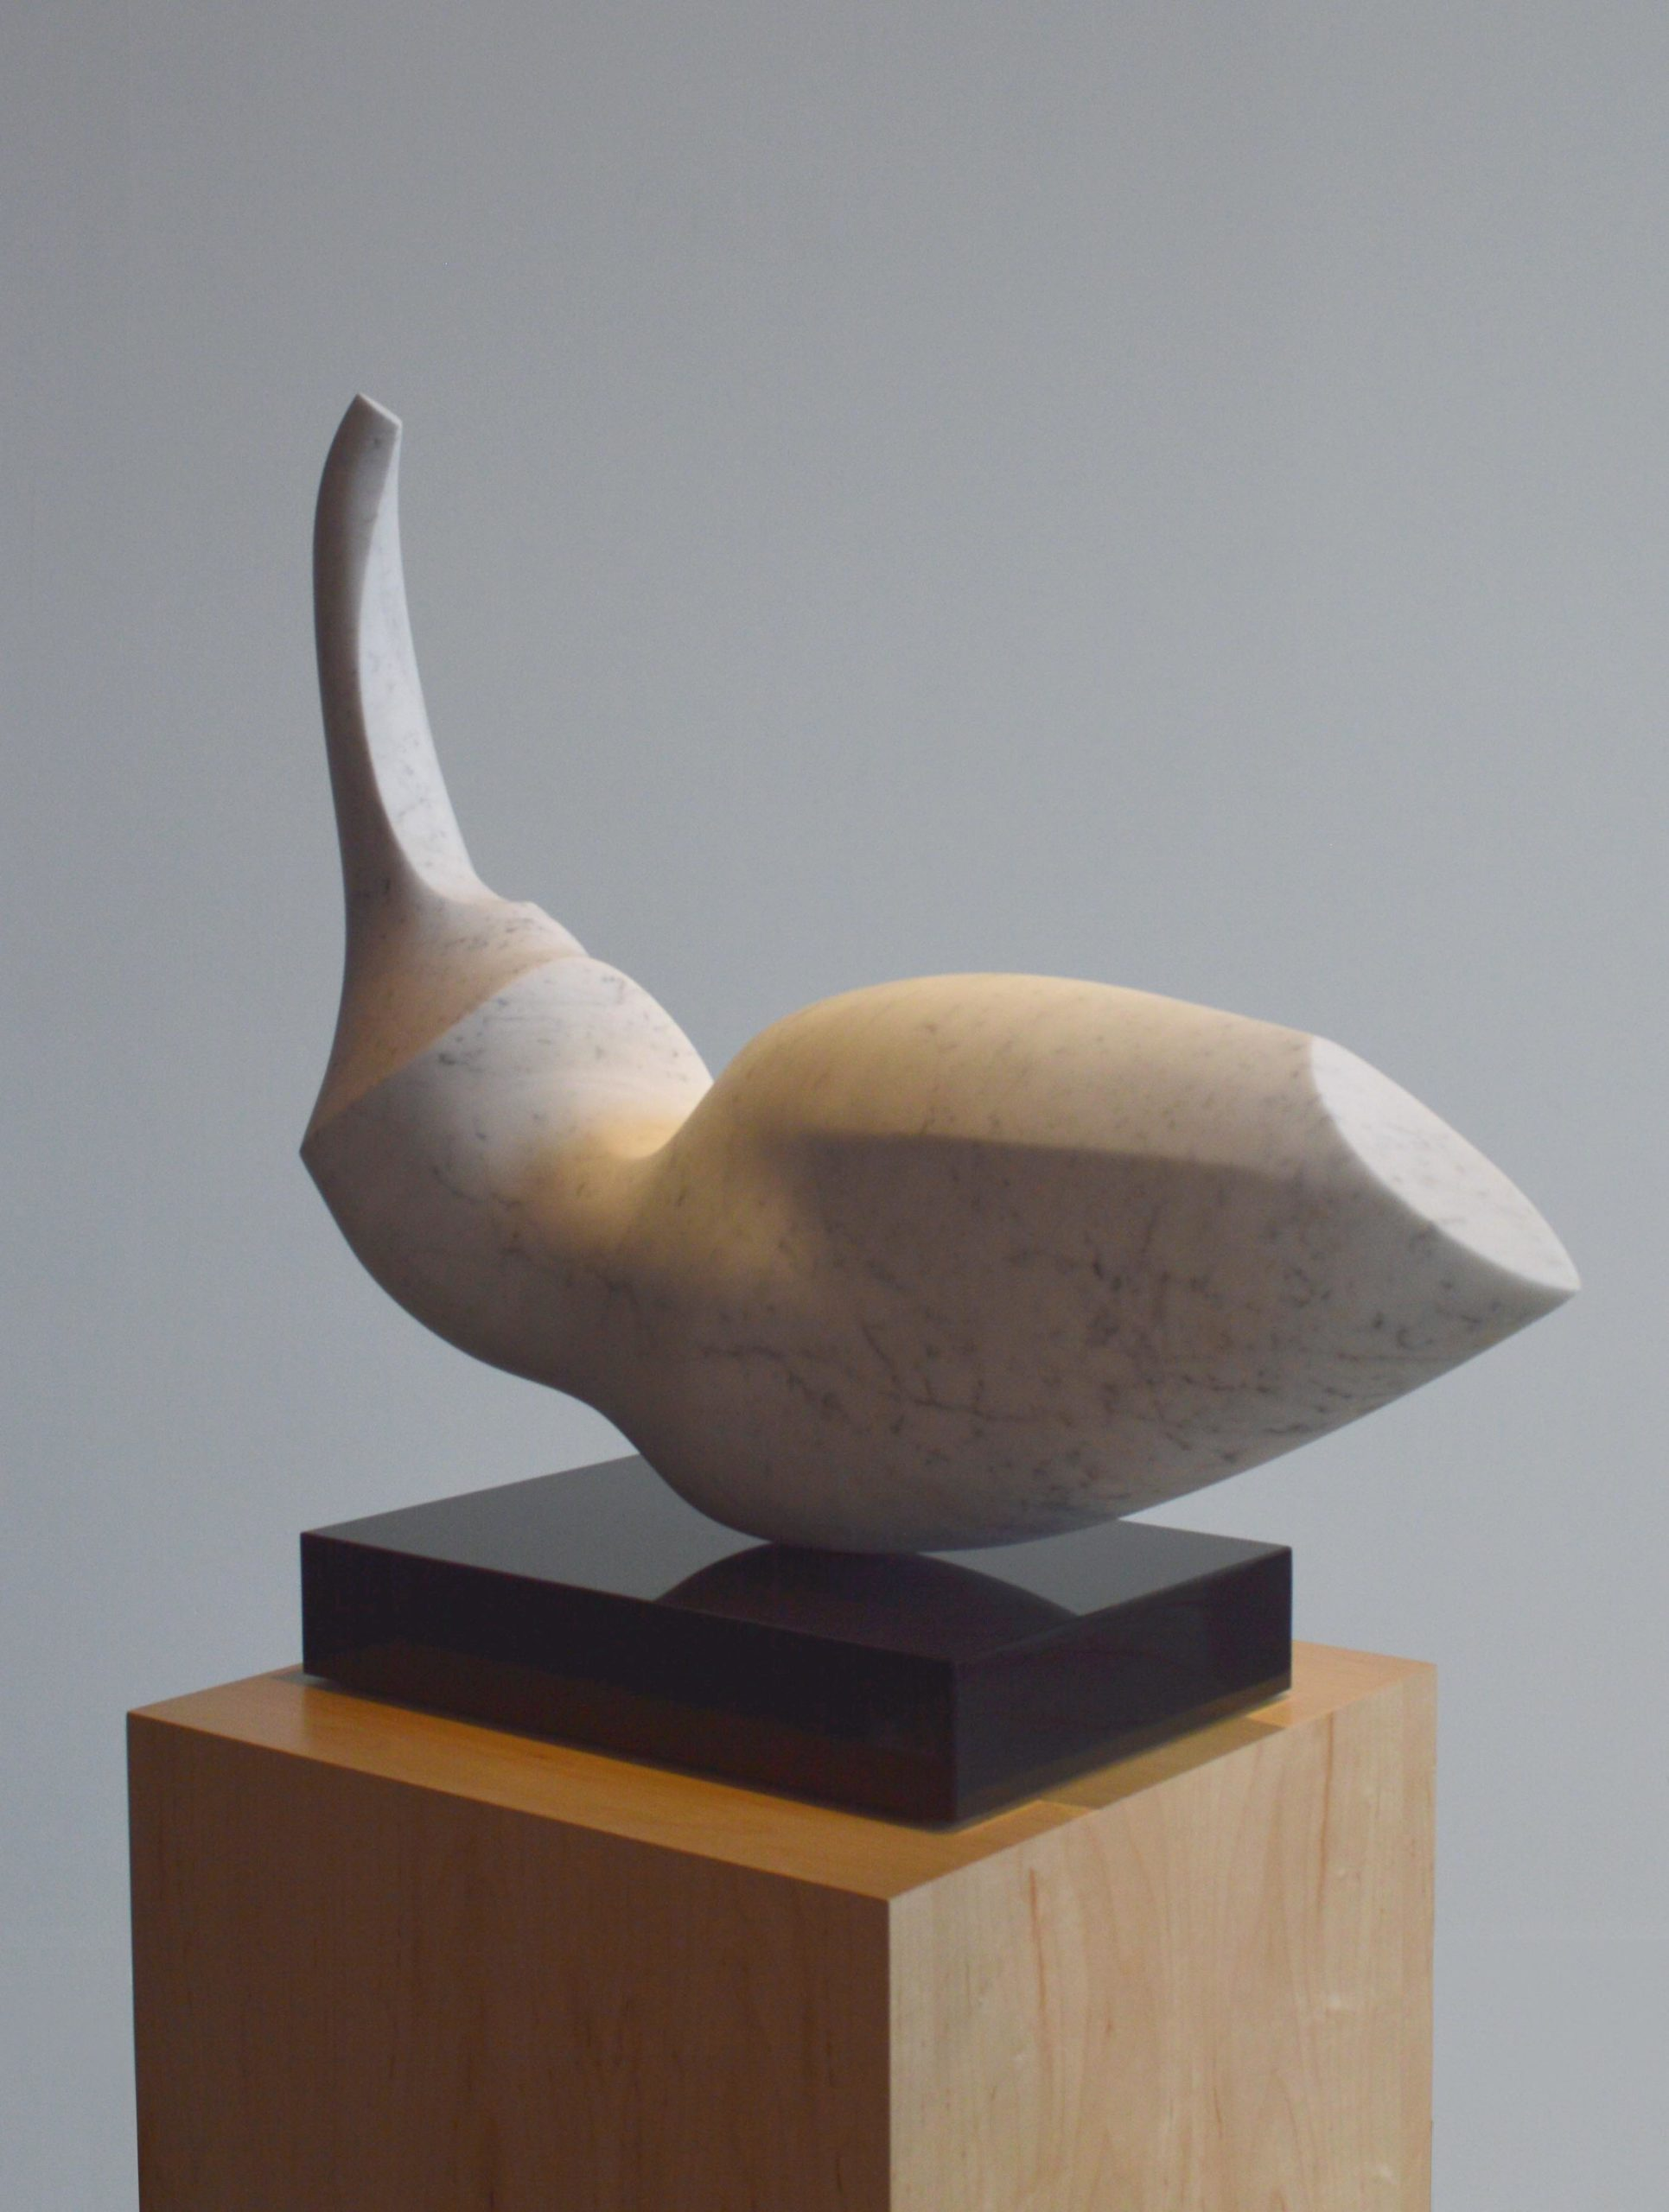 michael binkley sculptor stone sculpture abstract female torso marble granite